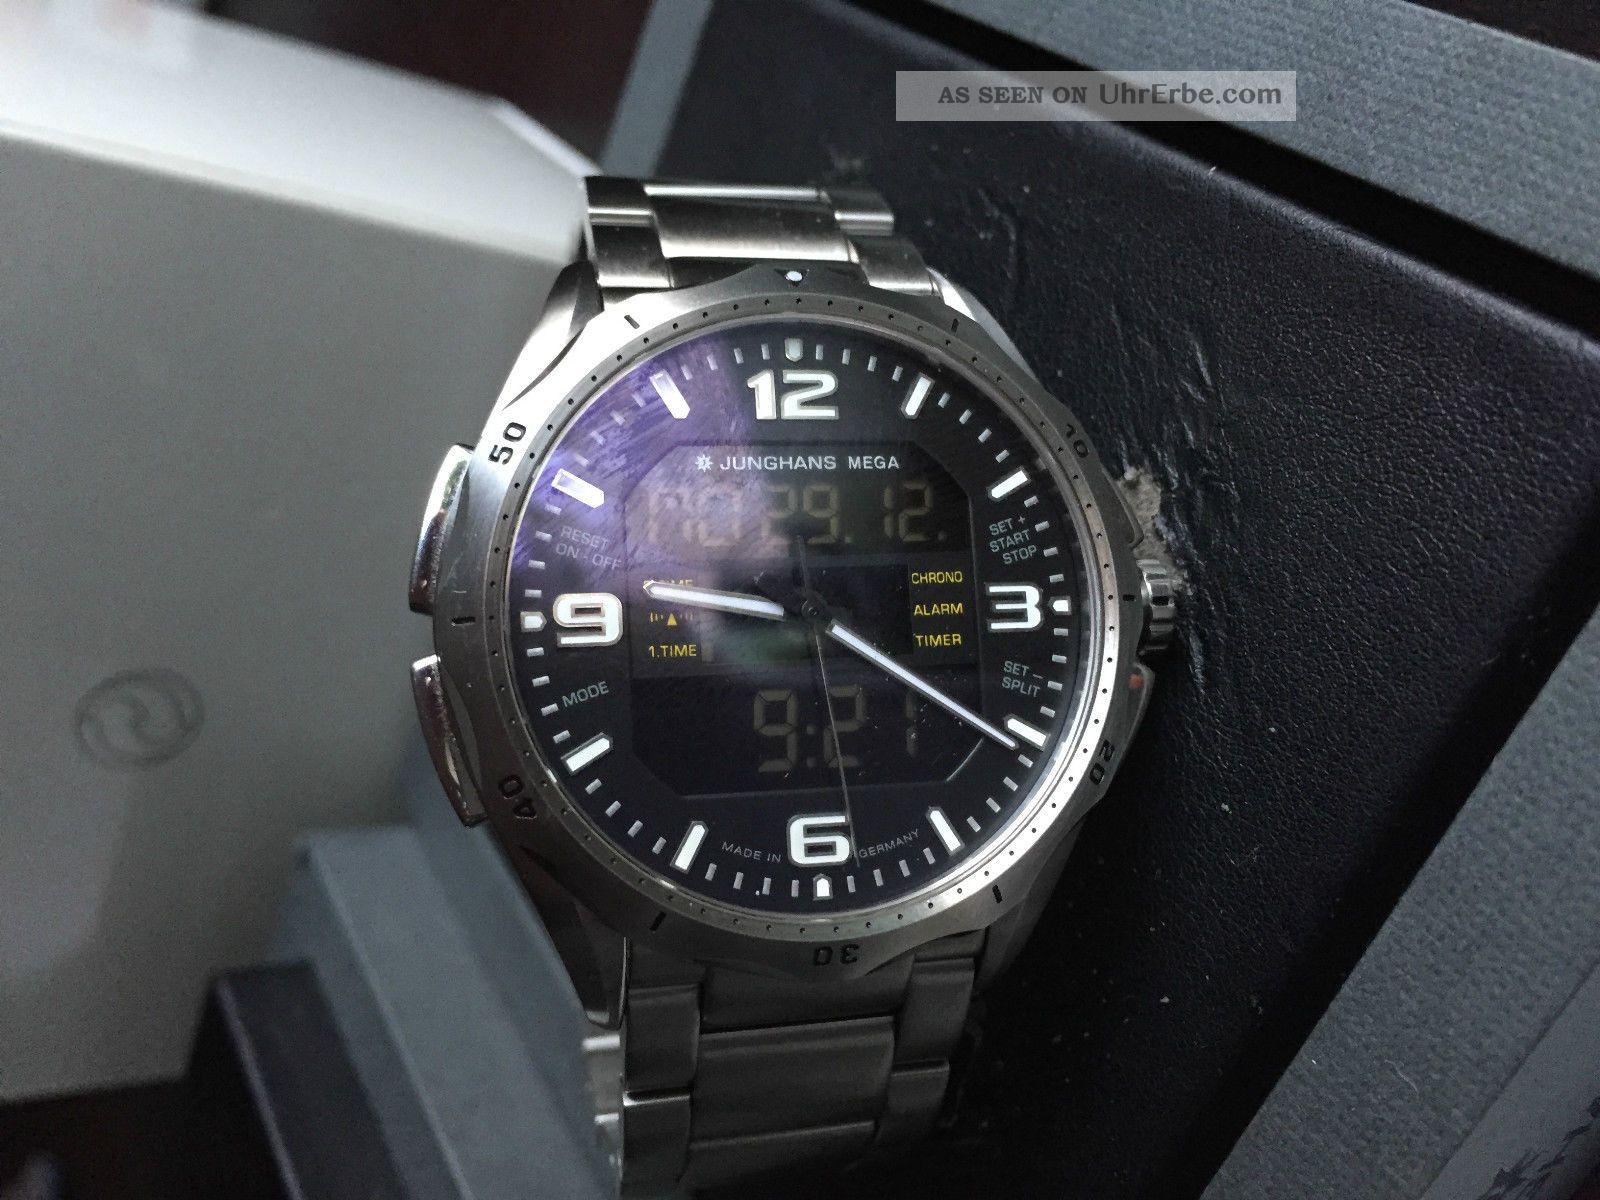 Junghans Mega Aviator Funkuhr Armbanduhren Bild